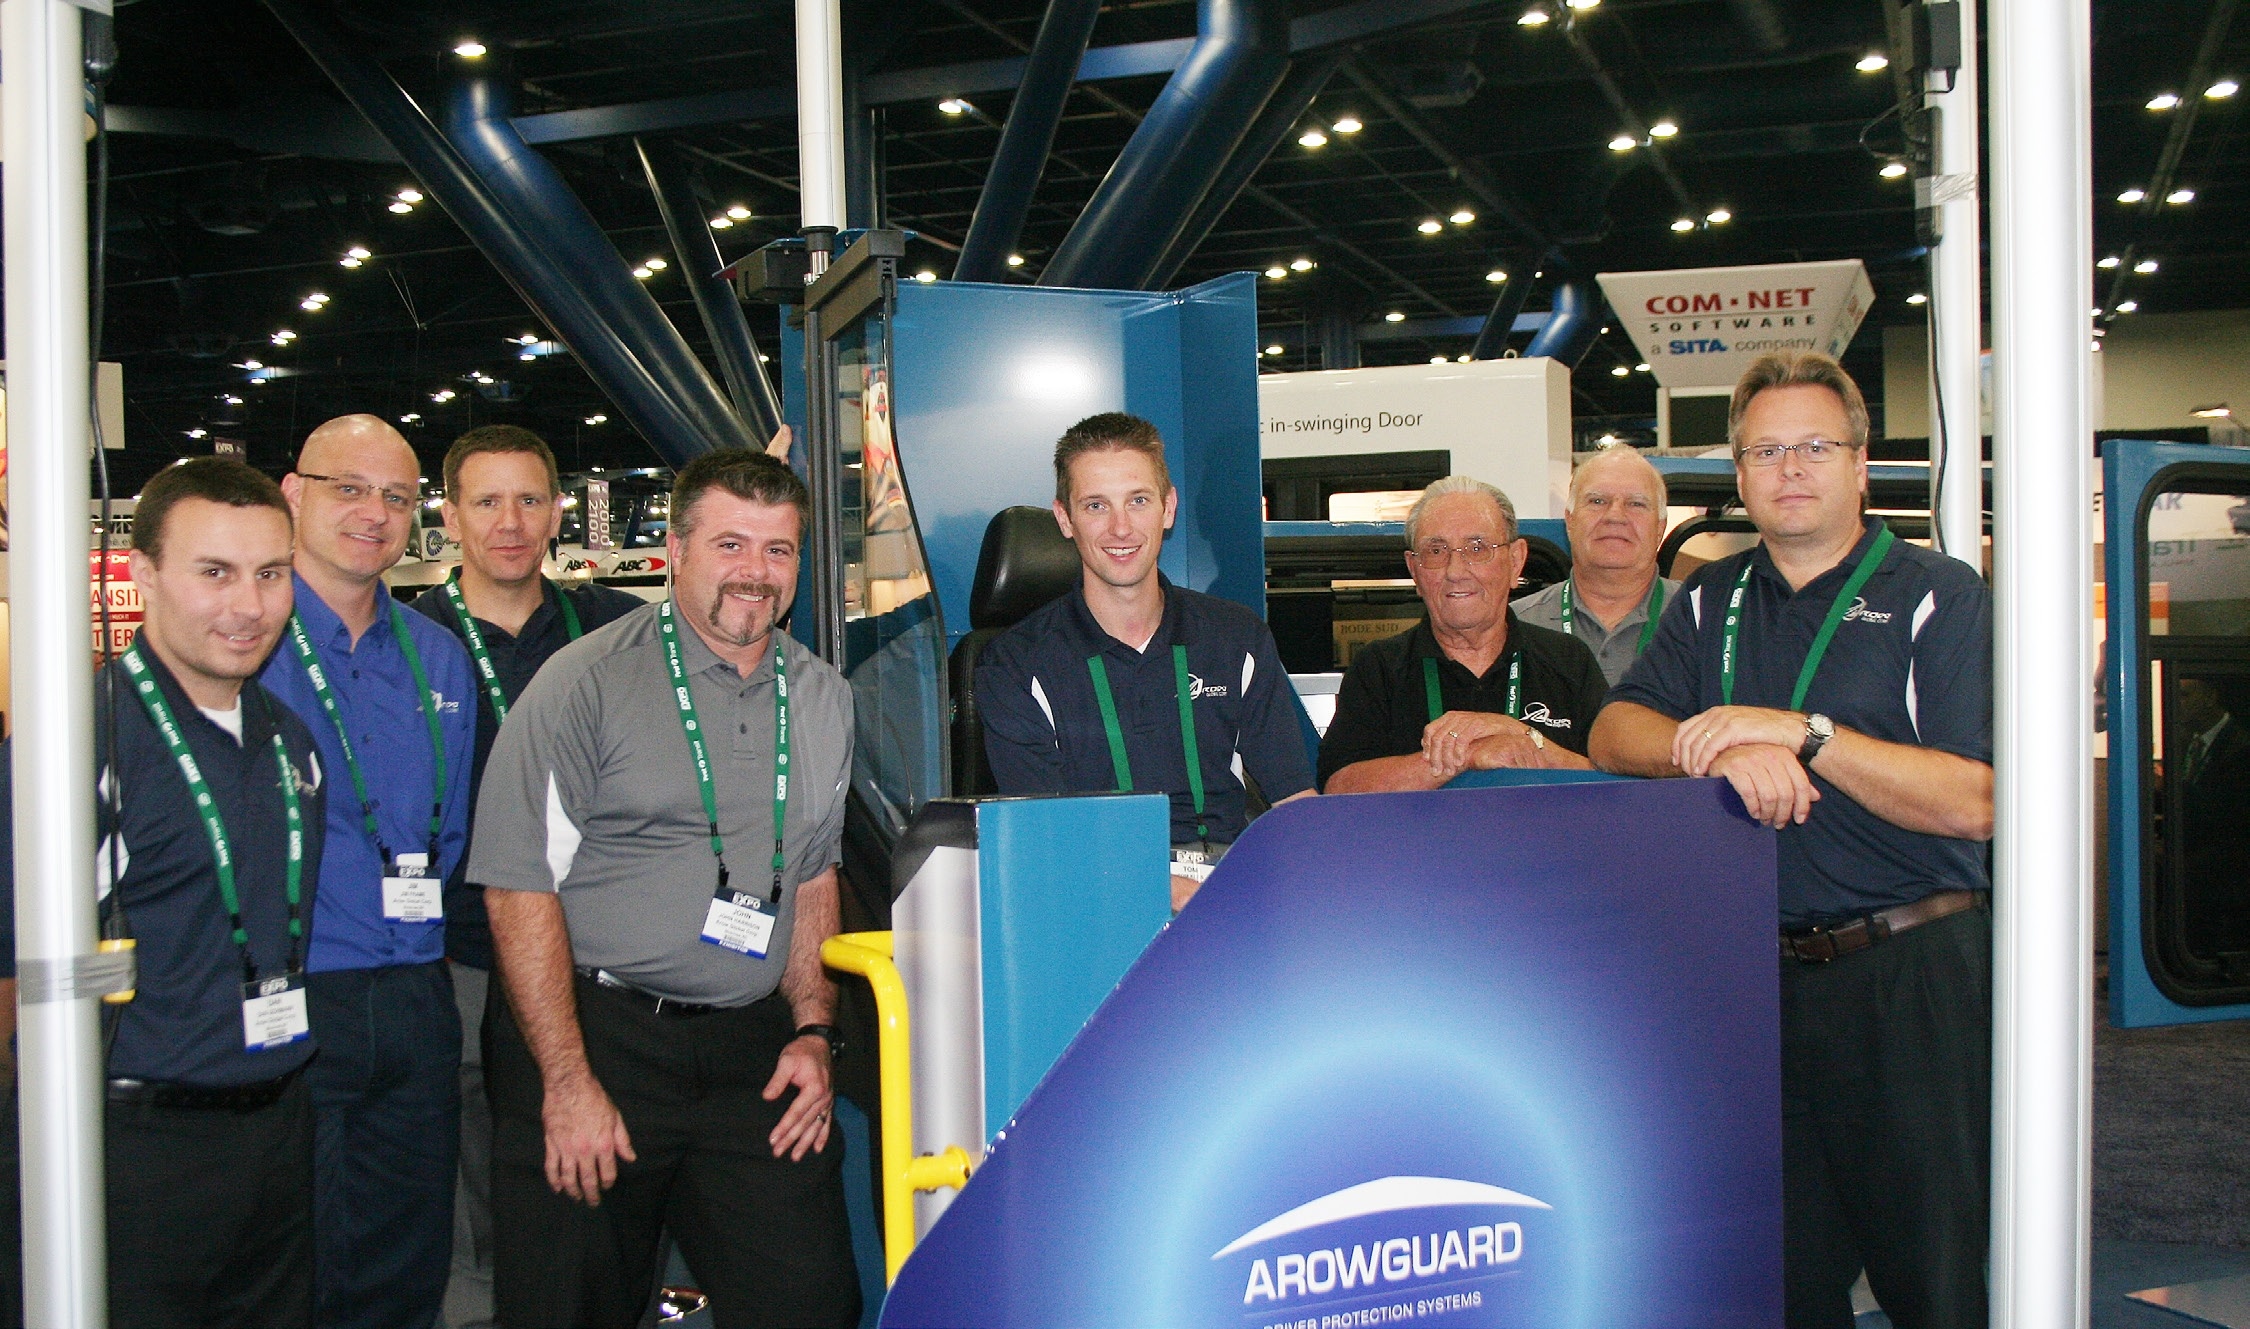 A group shot of 8 men attending a trade show